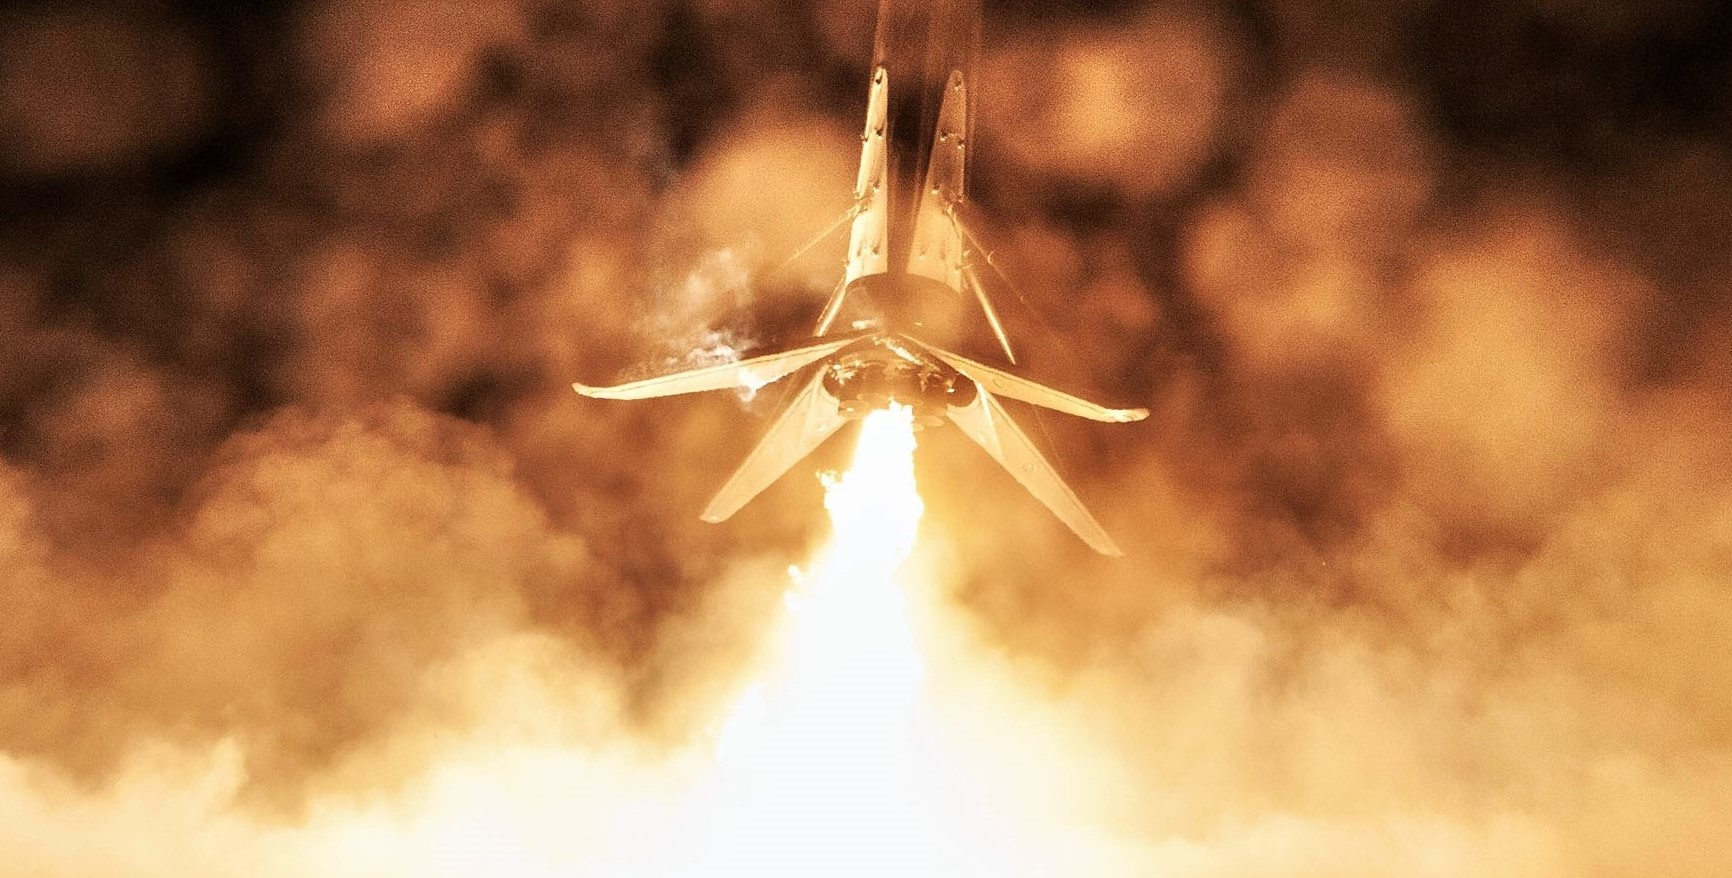 Falcon 9 B1051 DM-1 OCISLY landing (SpaceX) 1 crop 2